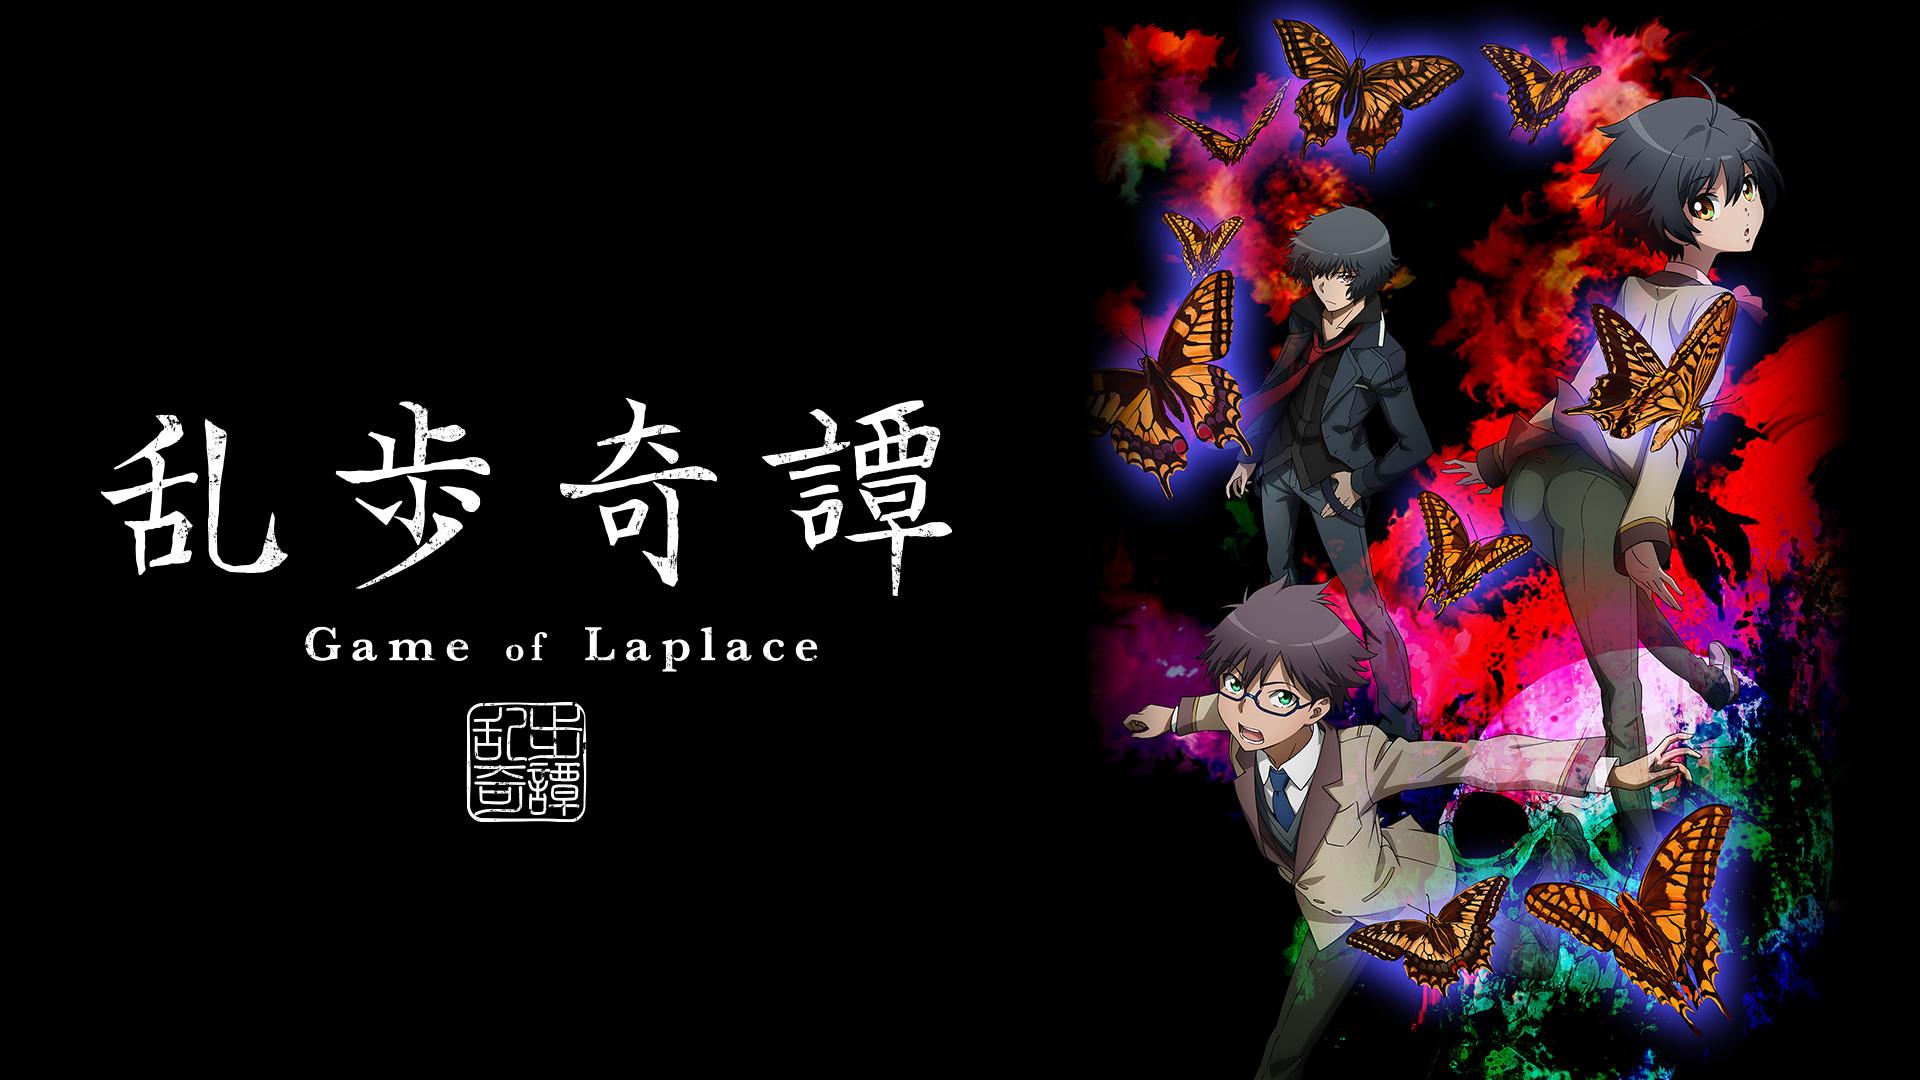 乱歩奇譚 Game of Laplace